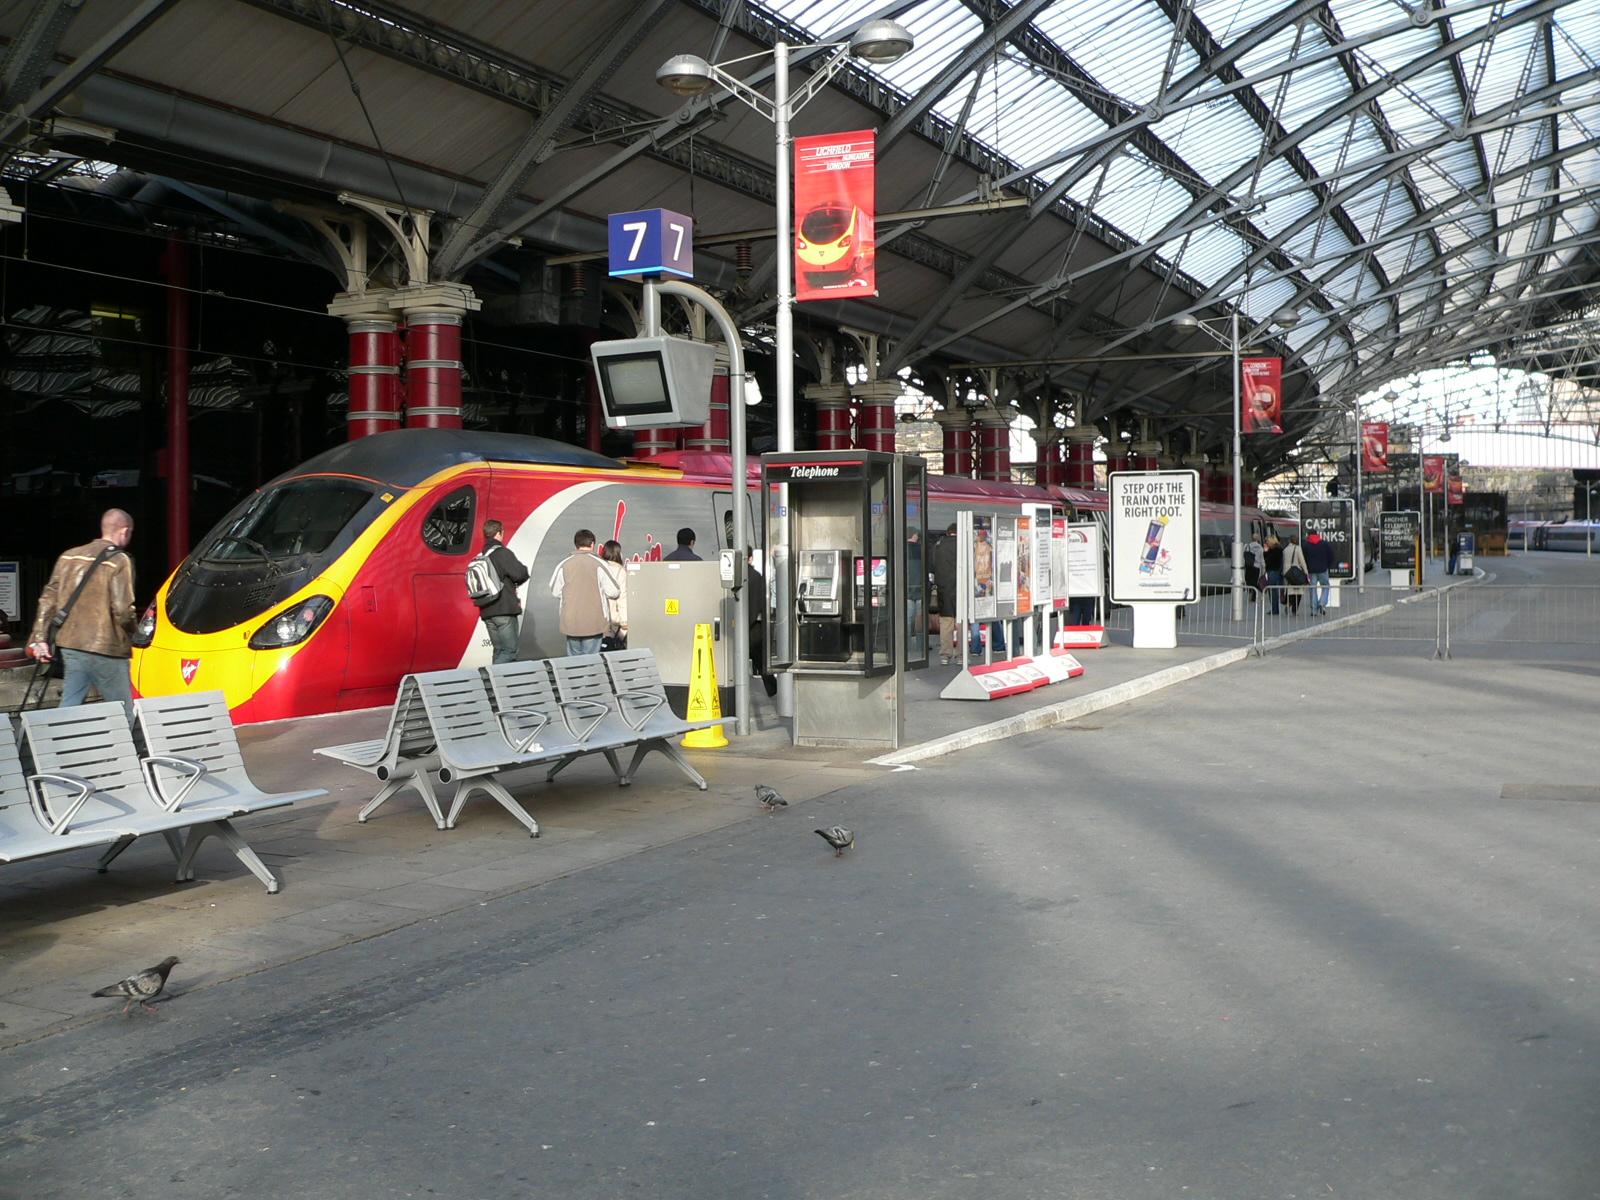 FilePlatform 7 At Liverpool Lime Street Railway Station 02